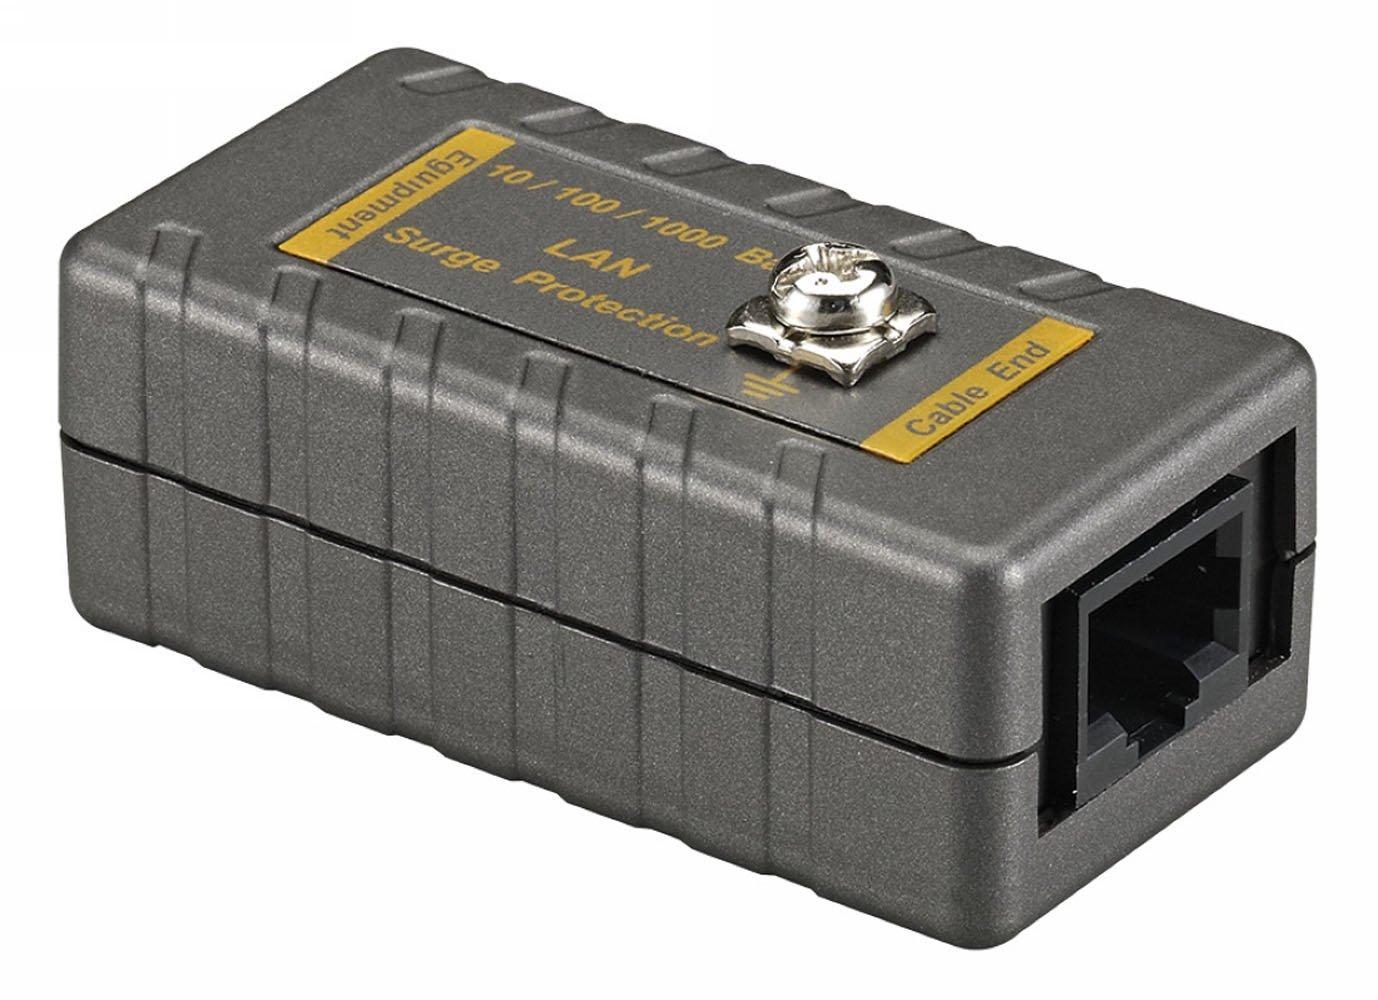 SPT 15-SP06U IP Camera Surge Protector (Gray)